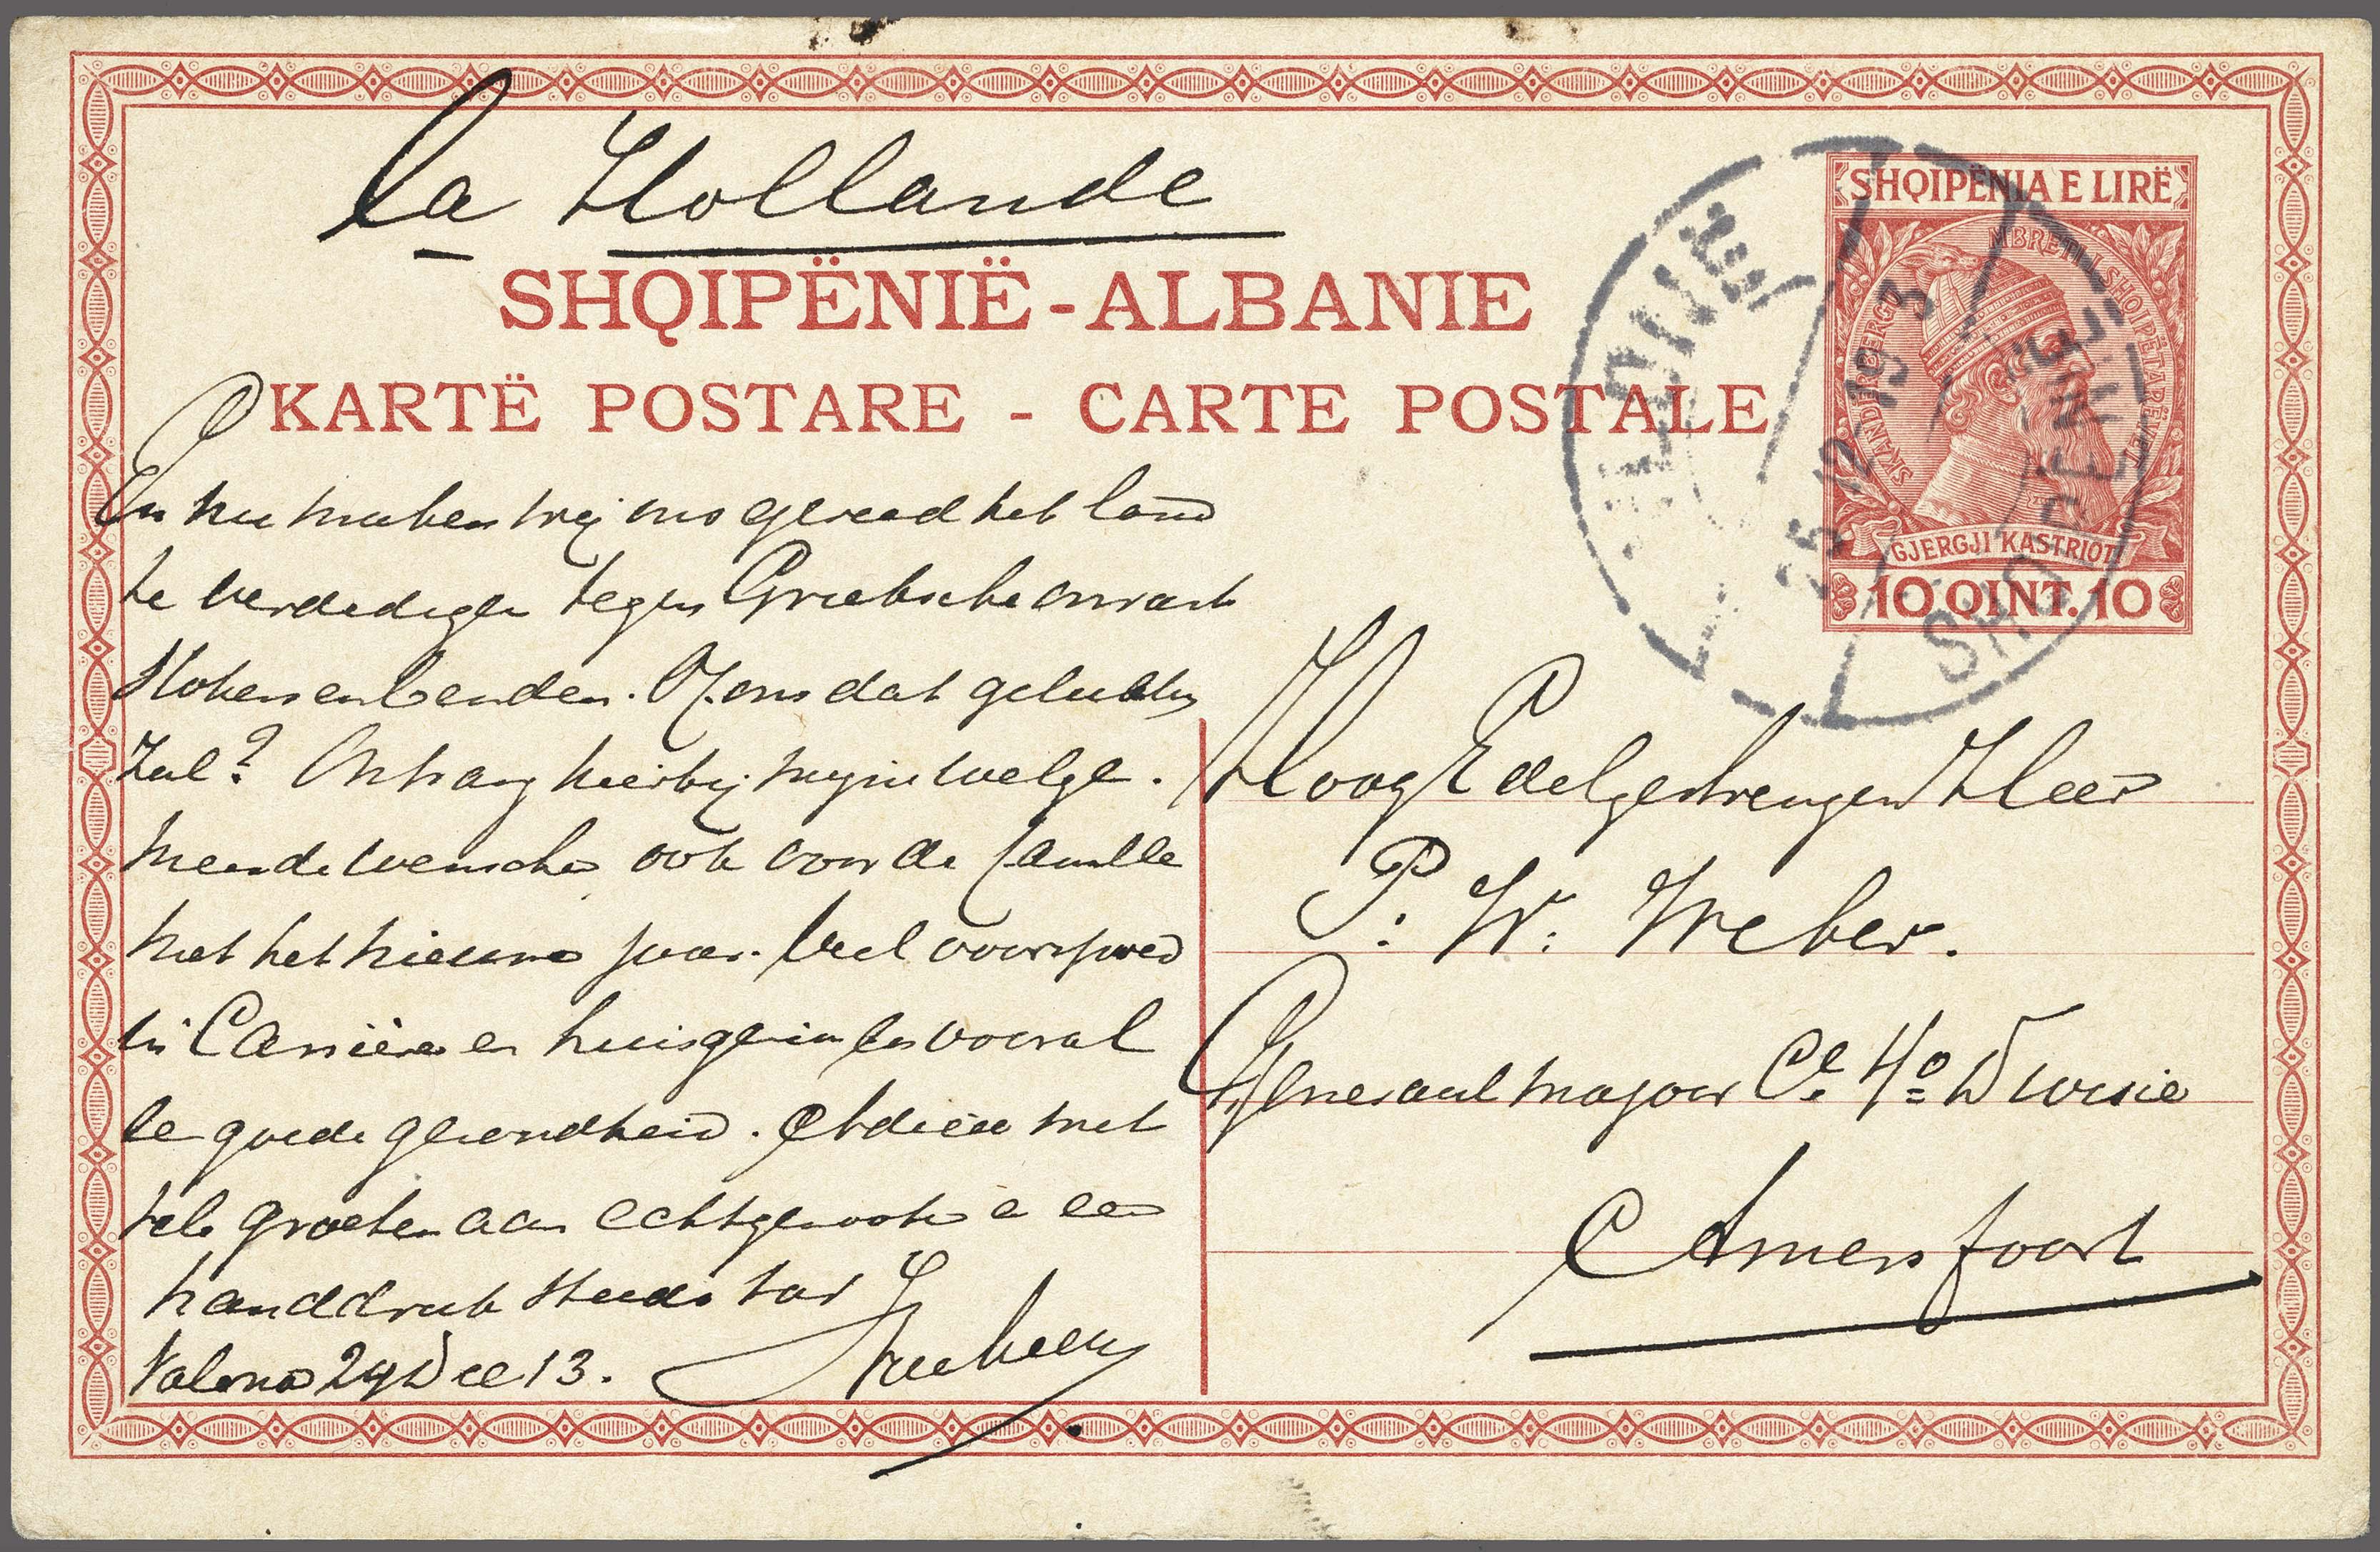 Lot 1 - European Countries Albania -  Corinphila Veilingen Auction 250-253 - Day 1 - Foreign countries